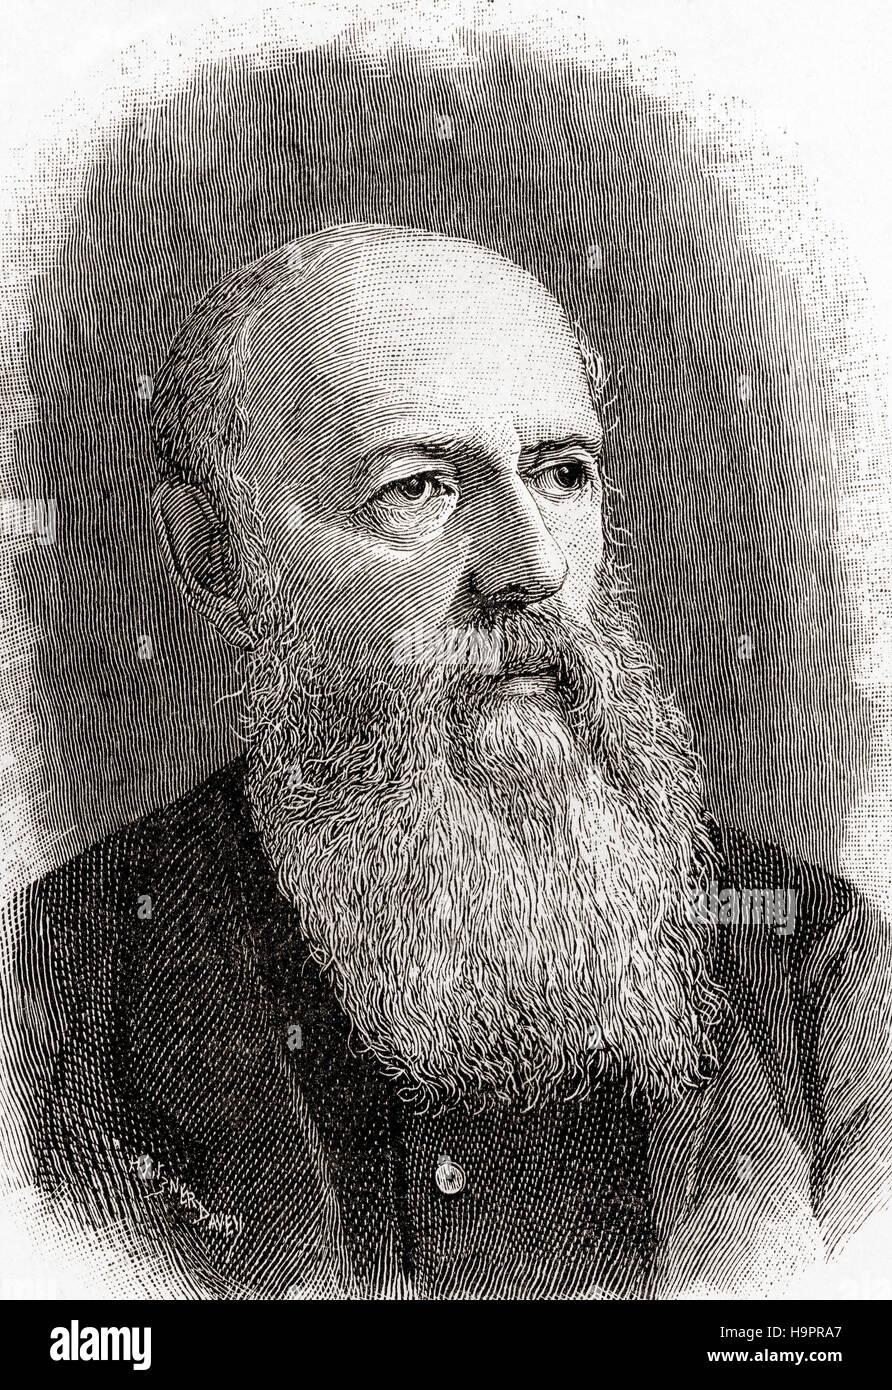 Sir Wilfrid Lawson, 2nd Baronet of Brayton, 1829 – 1906. English temperance campaigner and radical, anti-imperialist - Stock Image